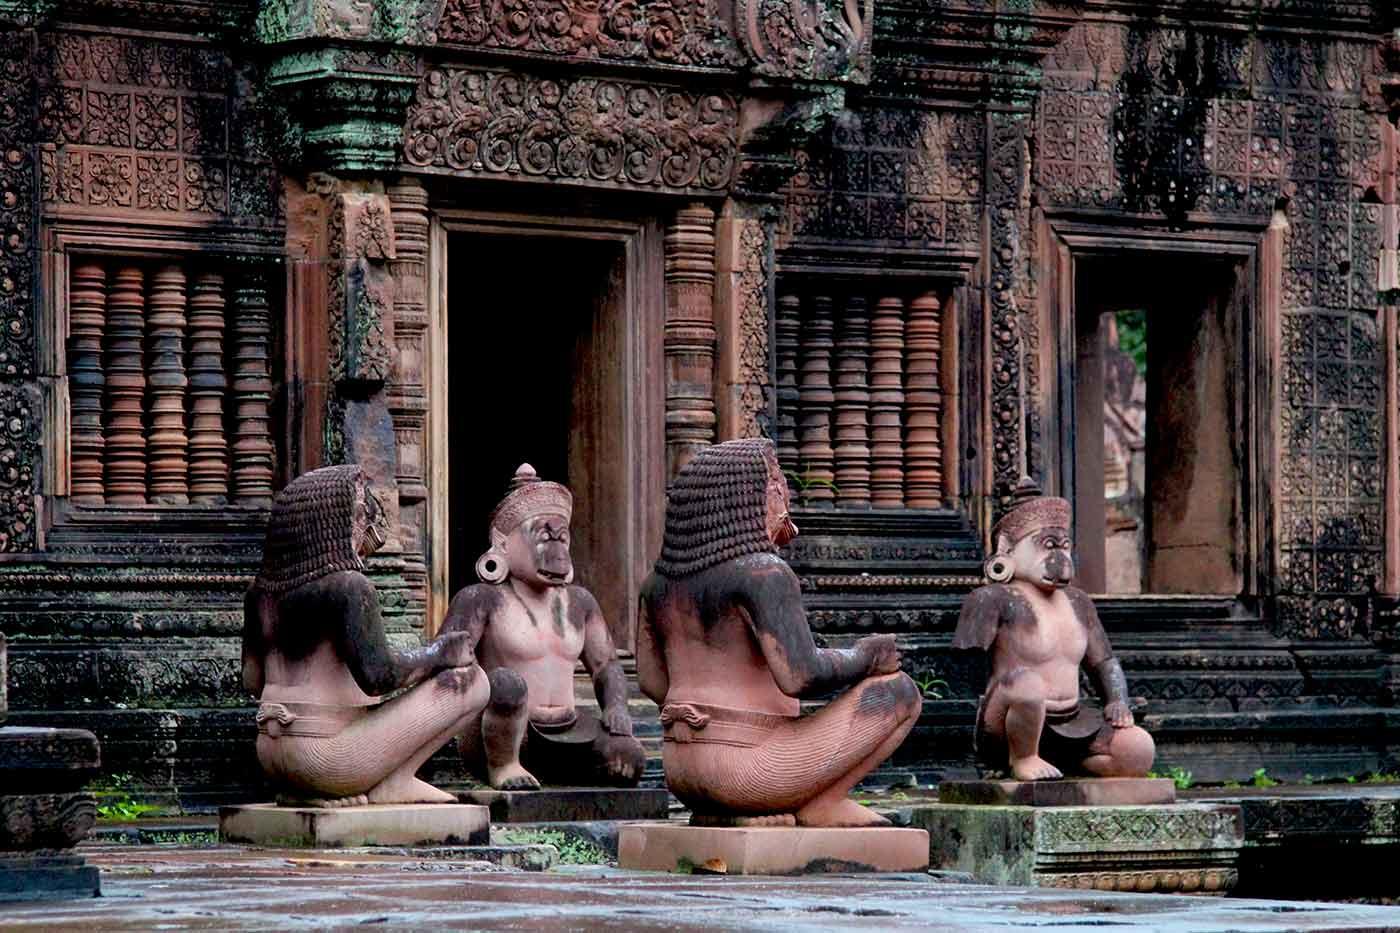 Banteay Srei - Angkor Tempel, Kambodscha